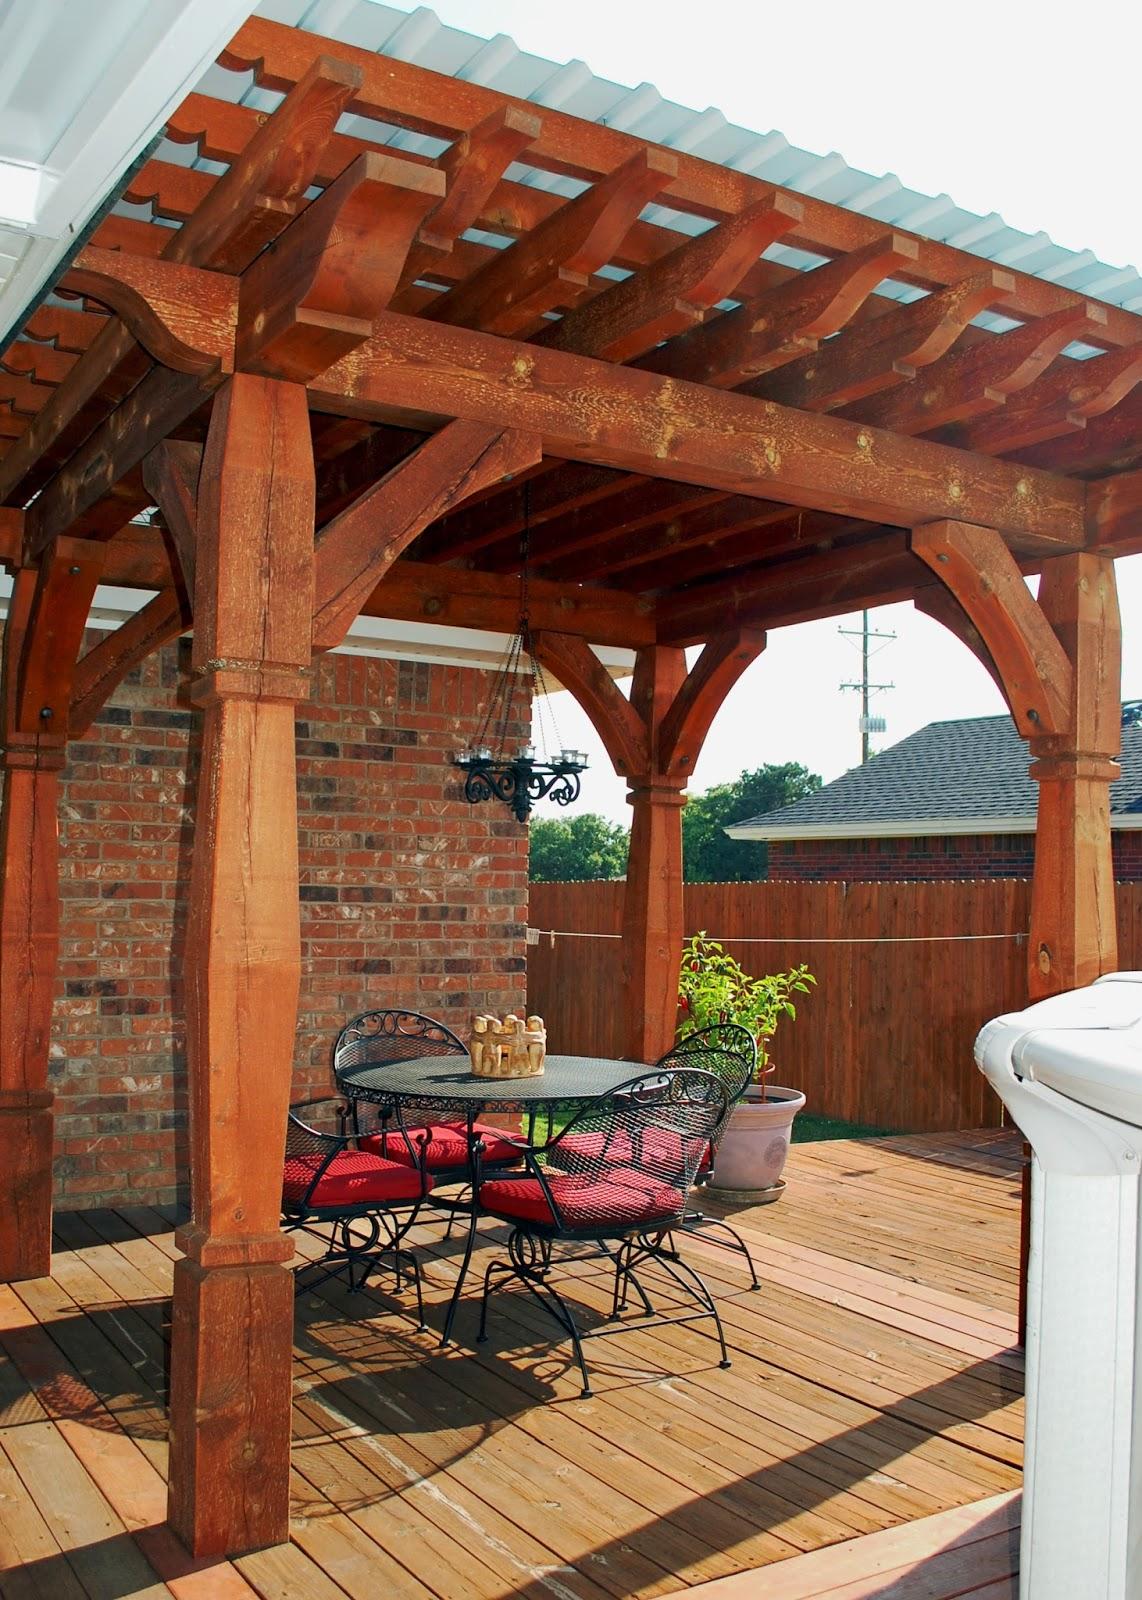 Clovis Living Real Estate Outdoor Living At It 39 S Best In Clovis